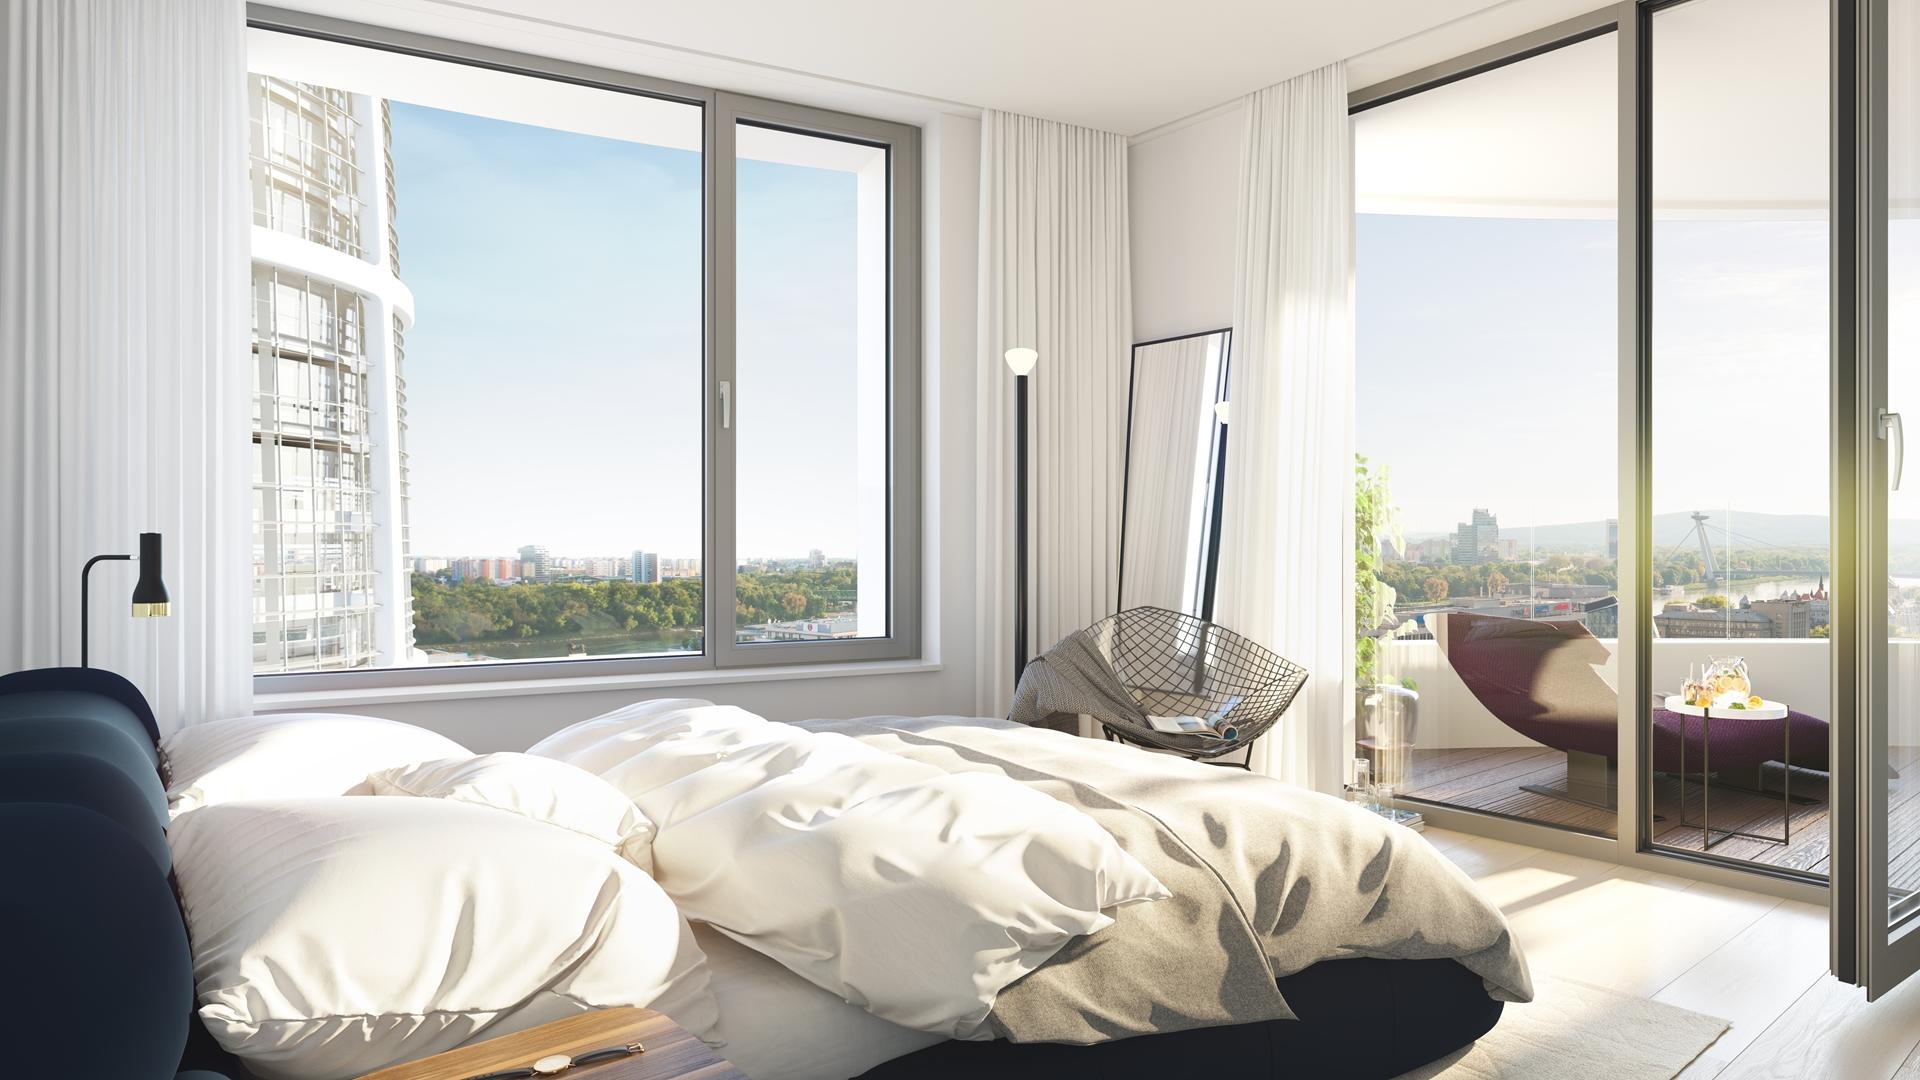 19_bedroom_2_©Penta_Investments (Copy)